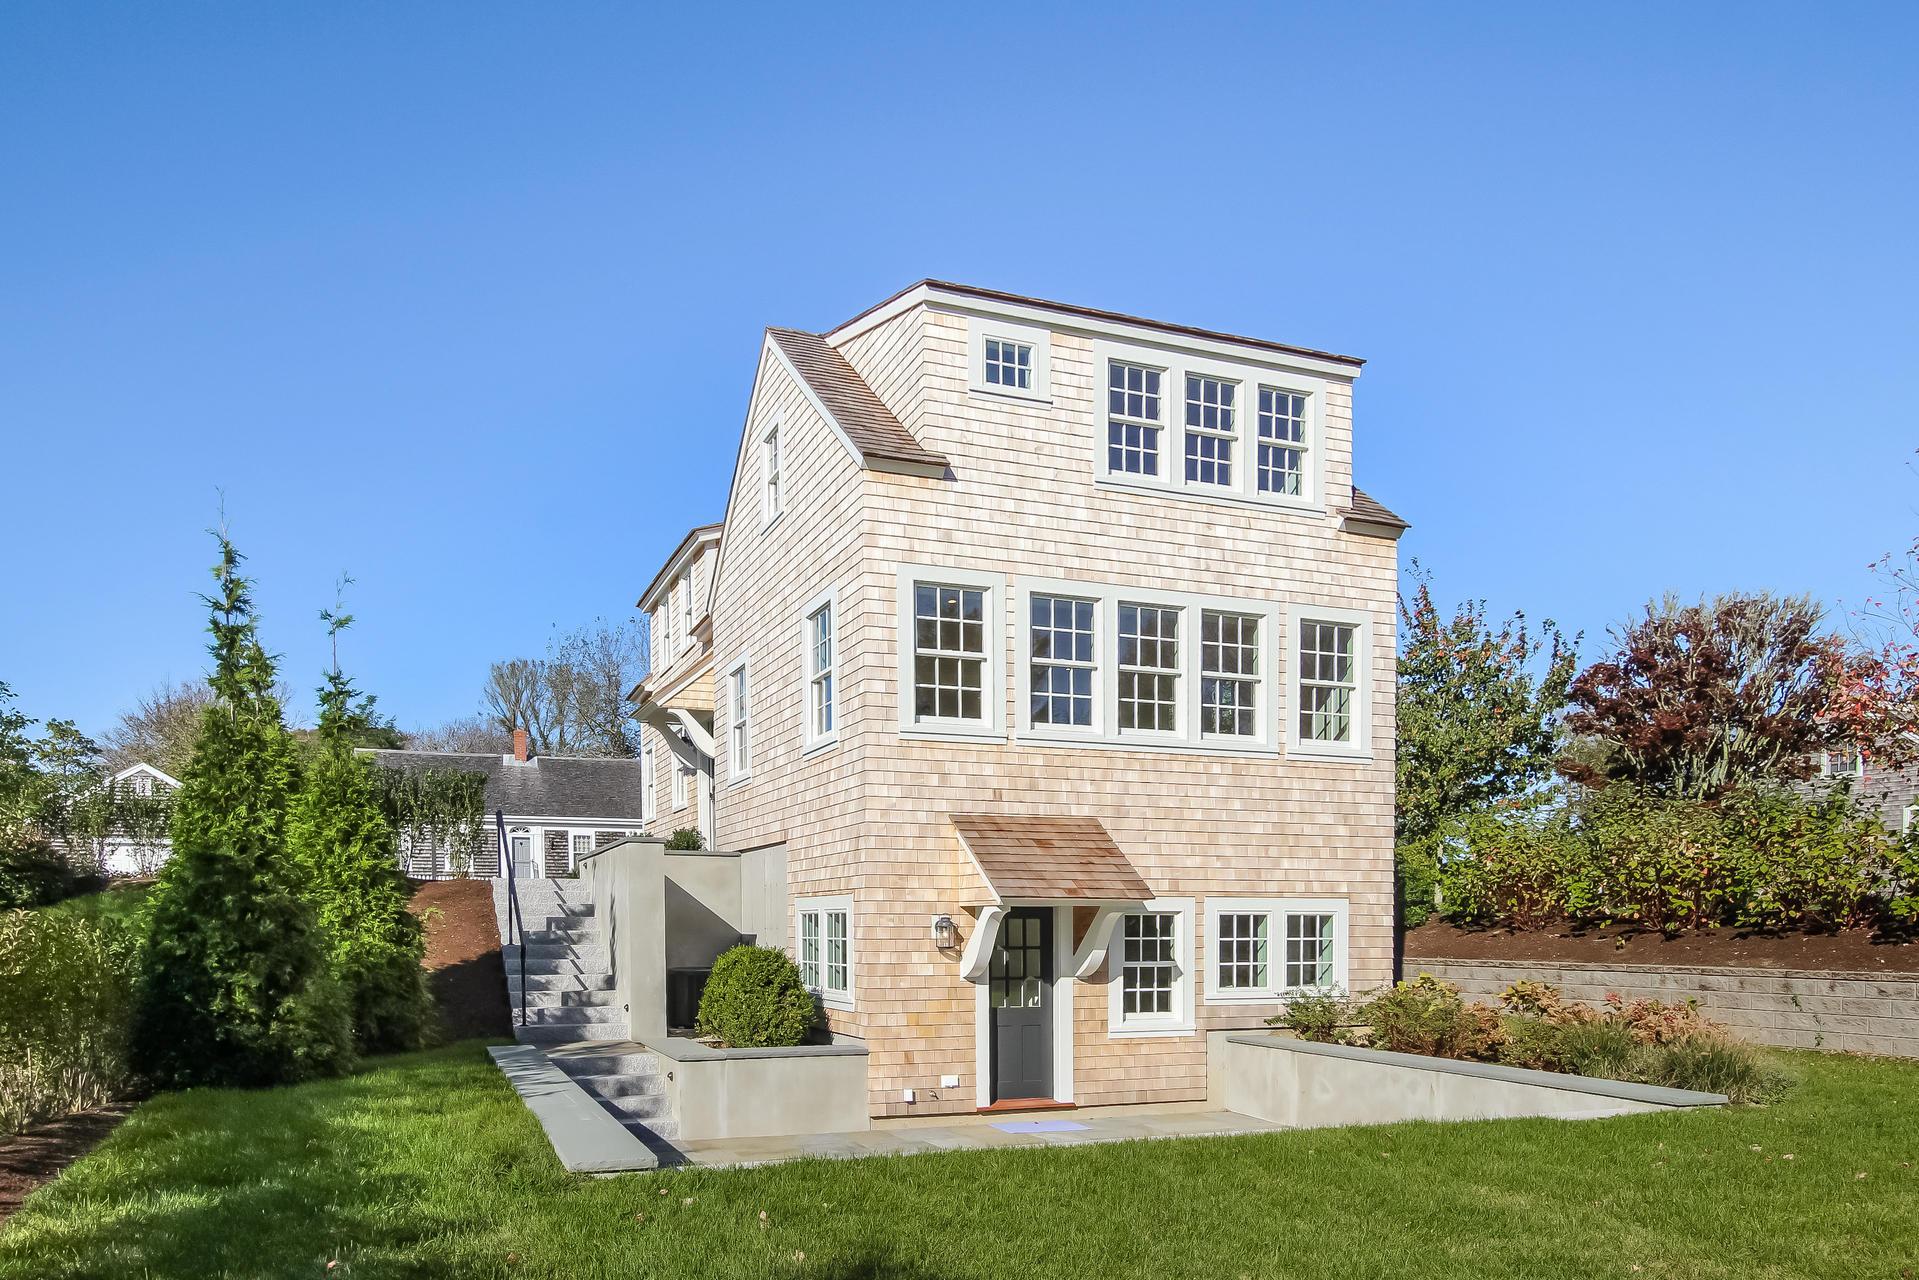 Additional photo for property listing at $1,995,000.00 - 43 Hallet Lane in Chatham 43 Hallet Lane Chatham, Massachusetts,02633 Estados Unidos